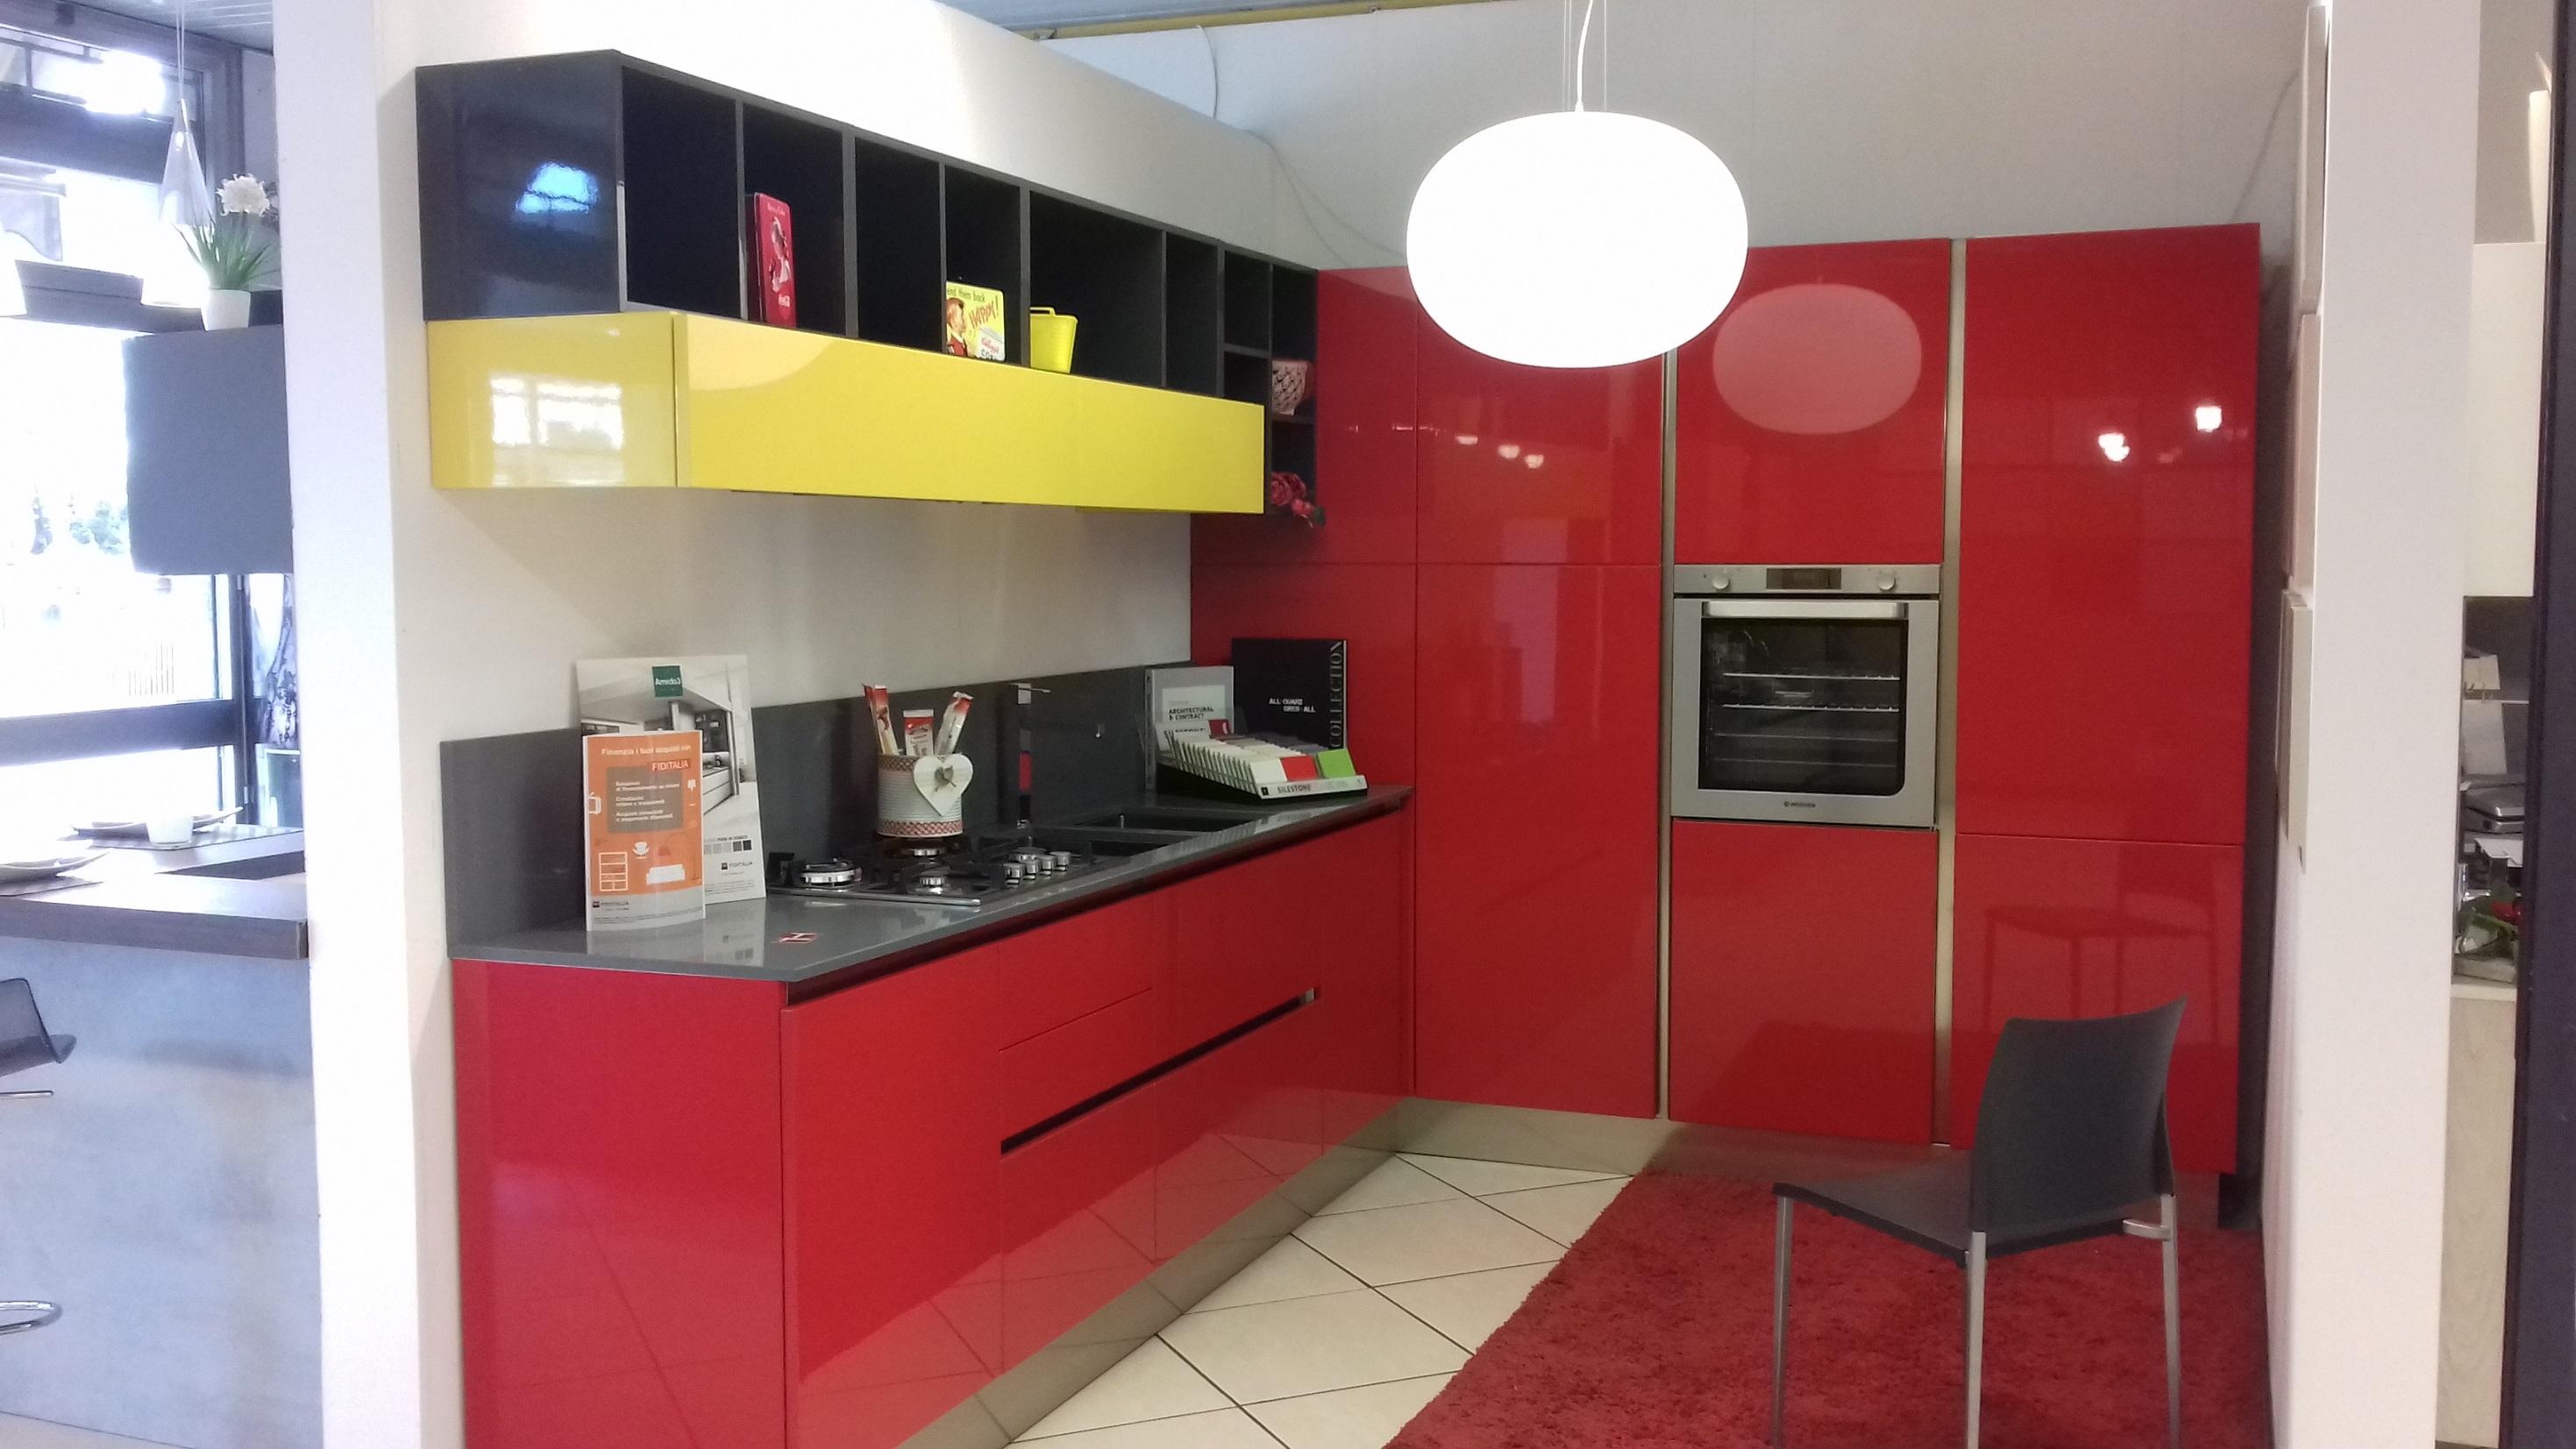 Cucine moderne bianche e rosse cucina moderna laccata grigio lucido cucina moderna effetto - Cucine grigio perla ...